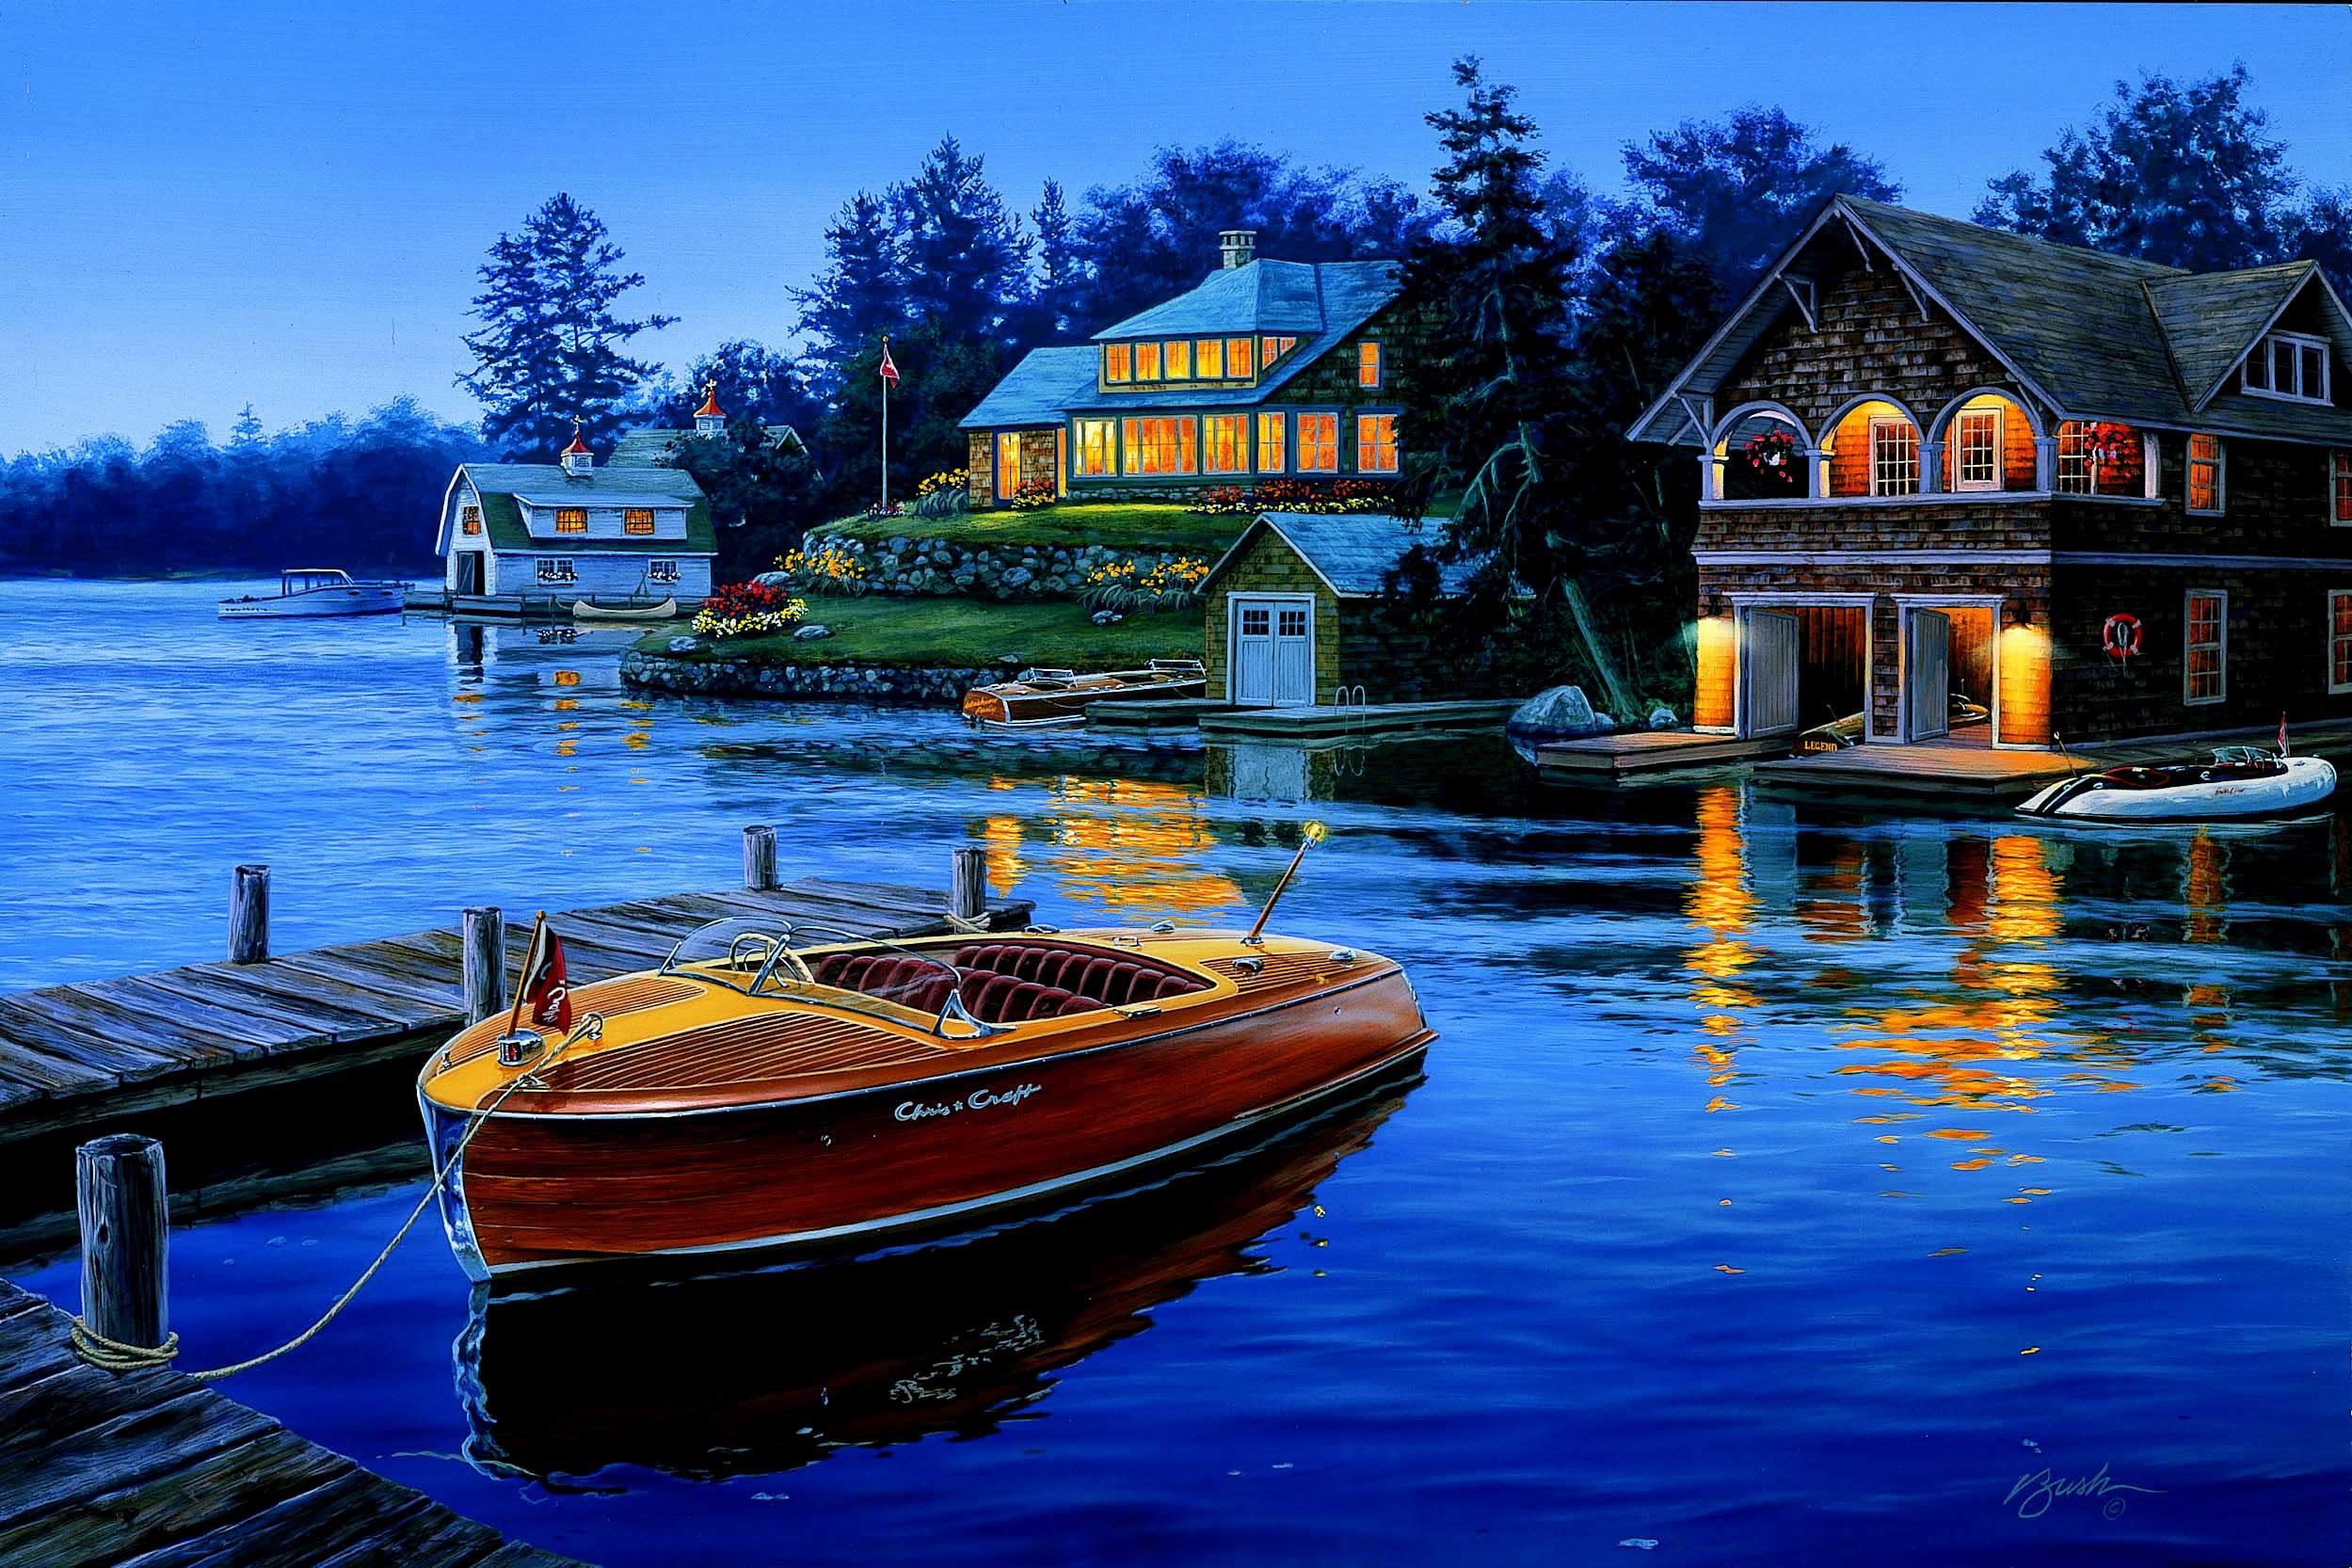 Wakeboarding Boat Wallpaper Chris craft, Classic b...